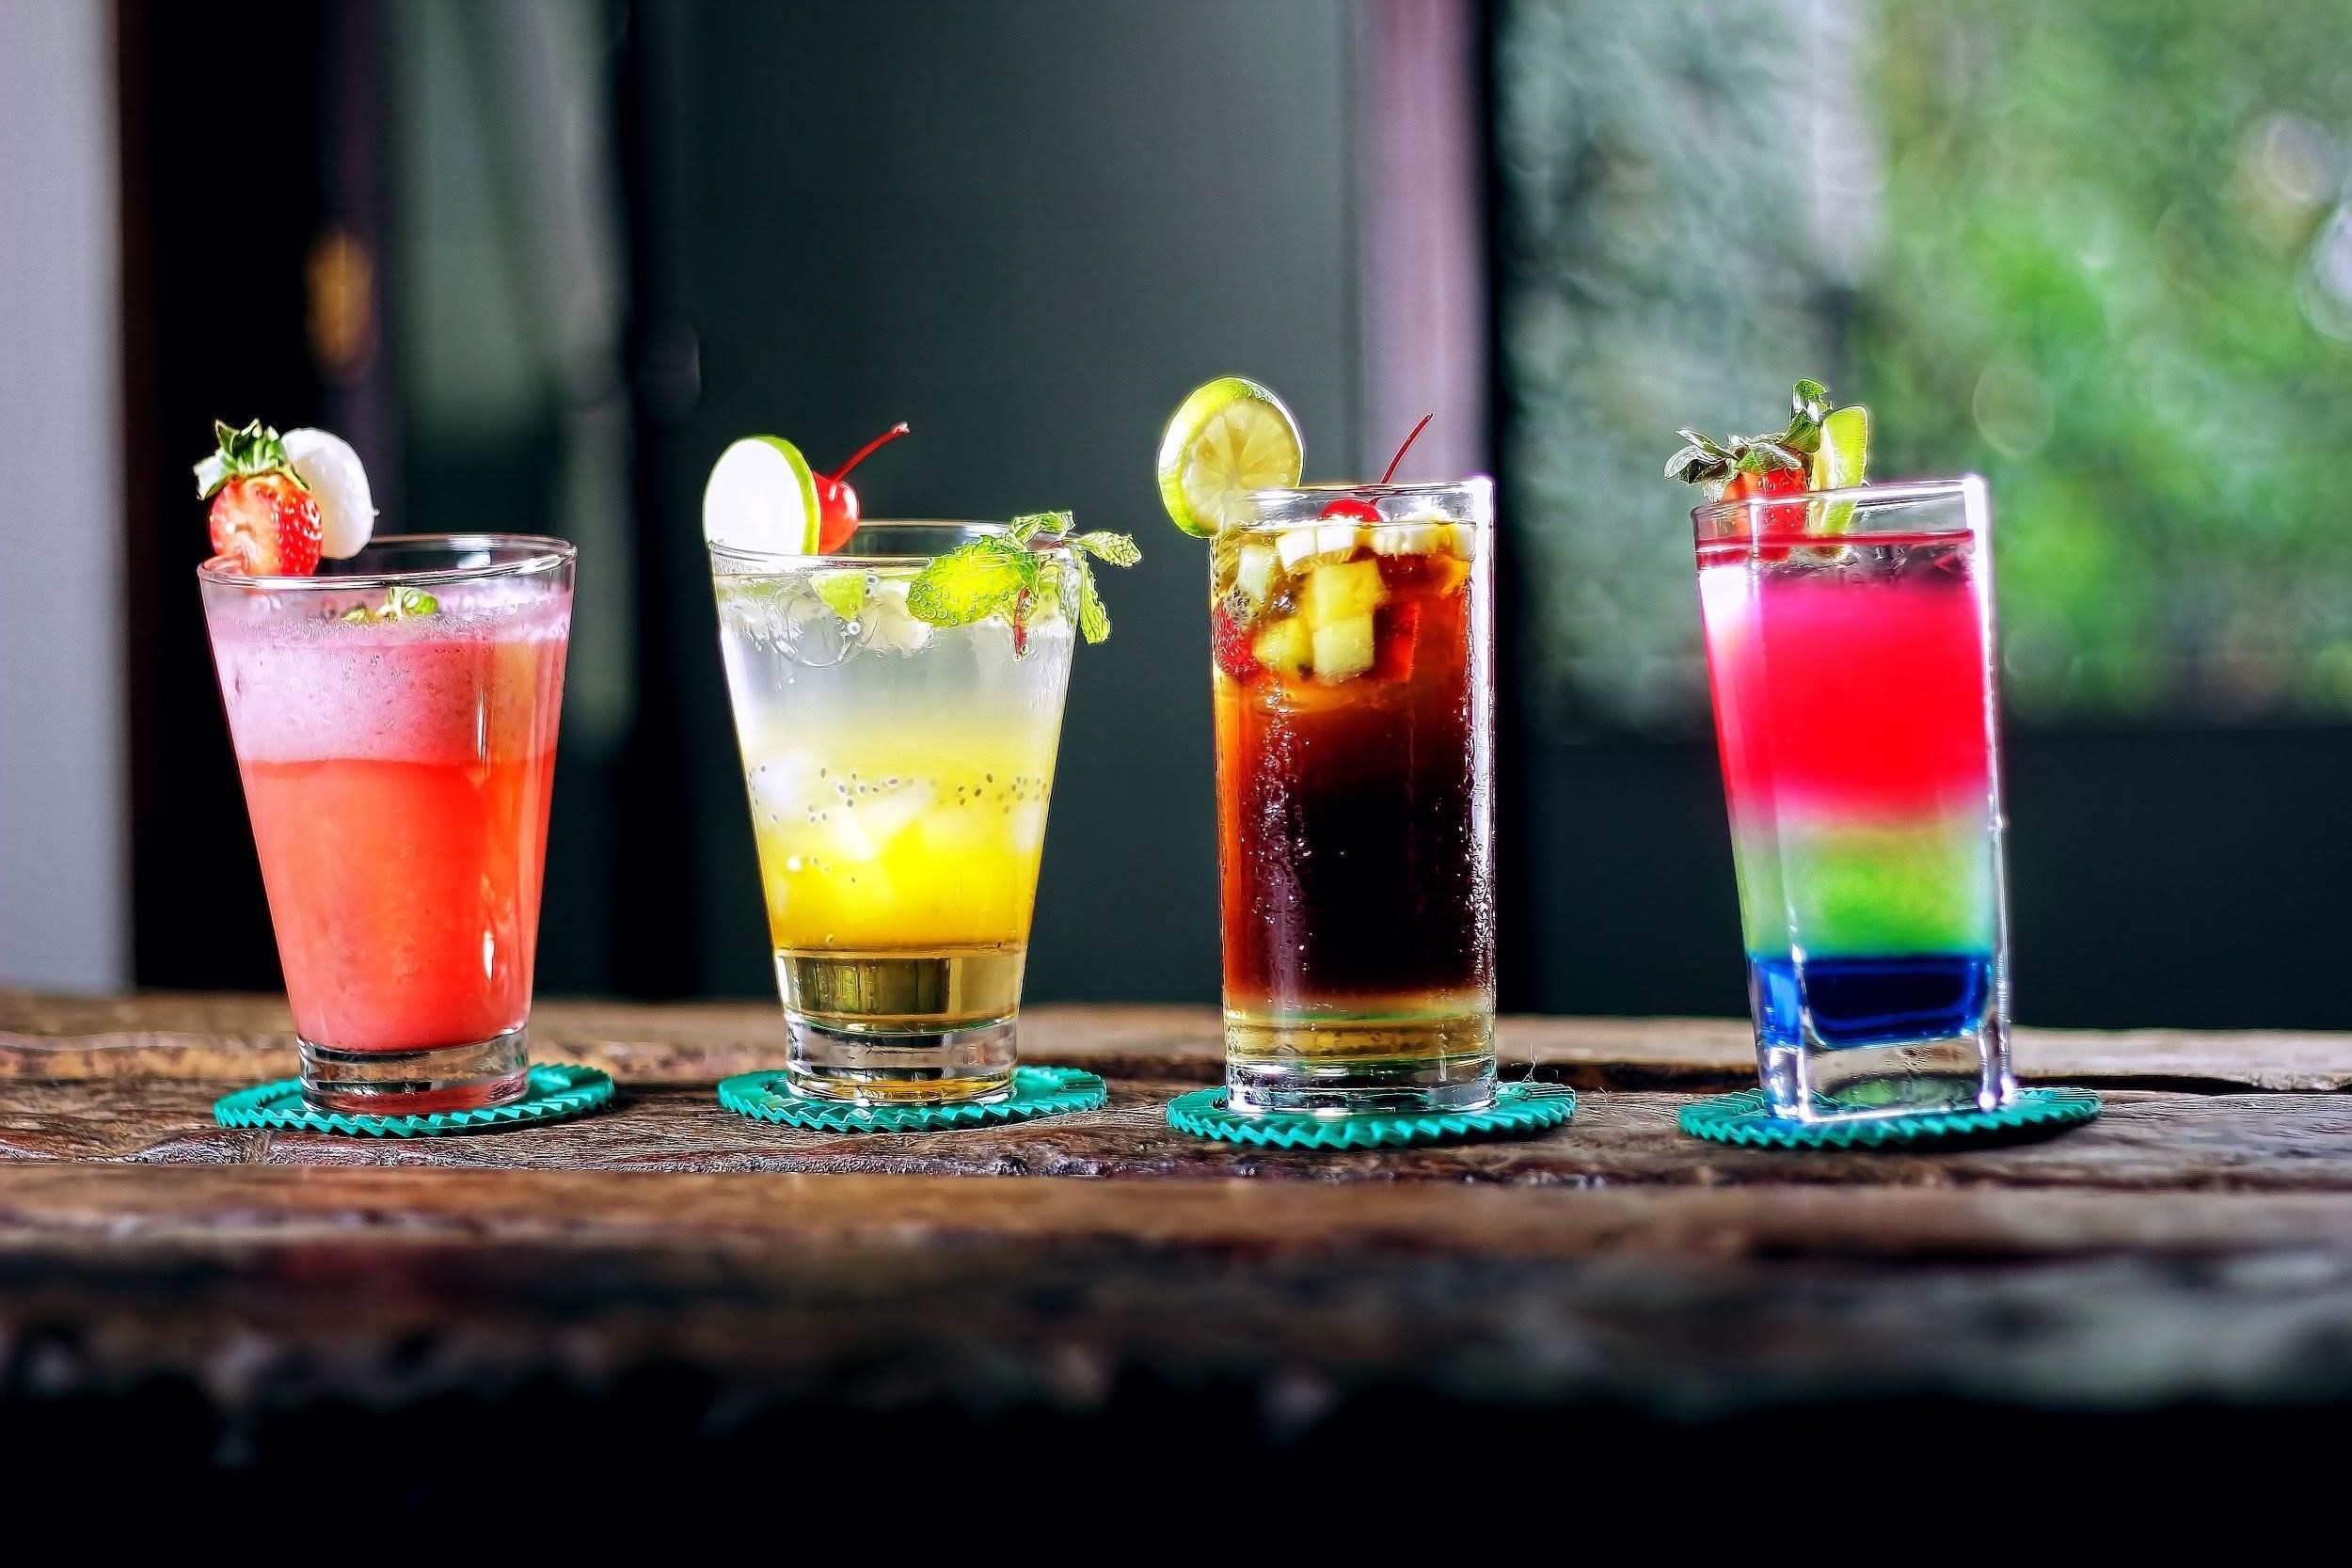 11 Ecommerce Shortcuts For Drinkpreneurs In 2018